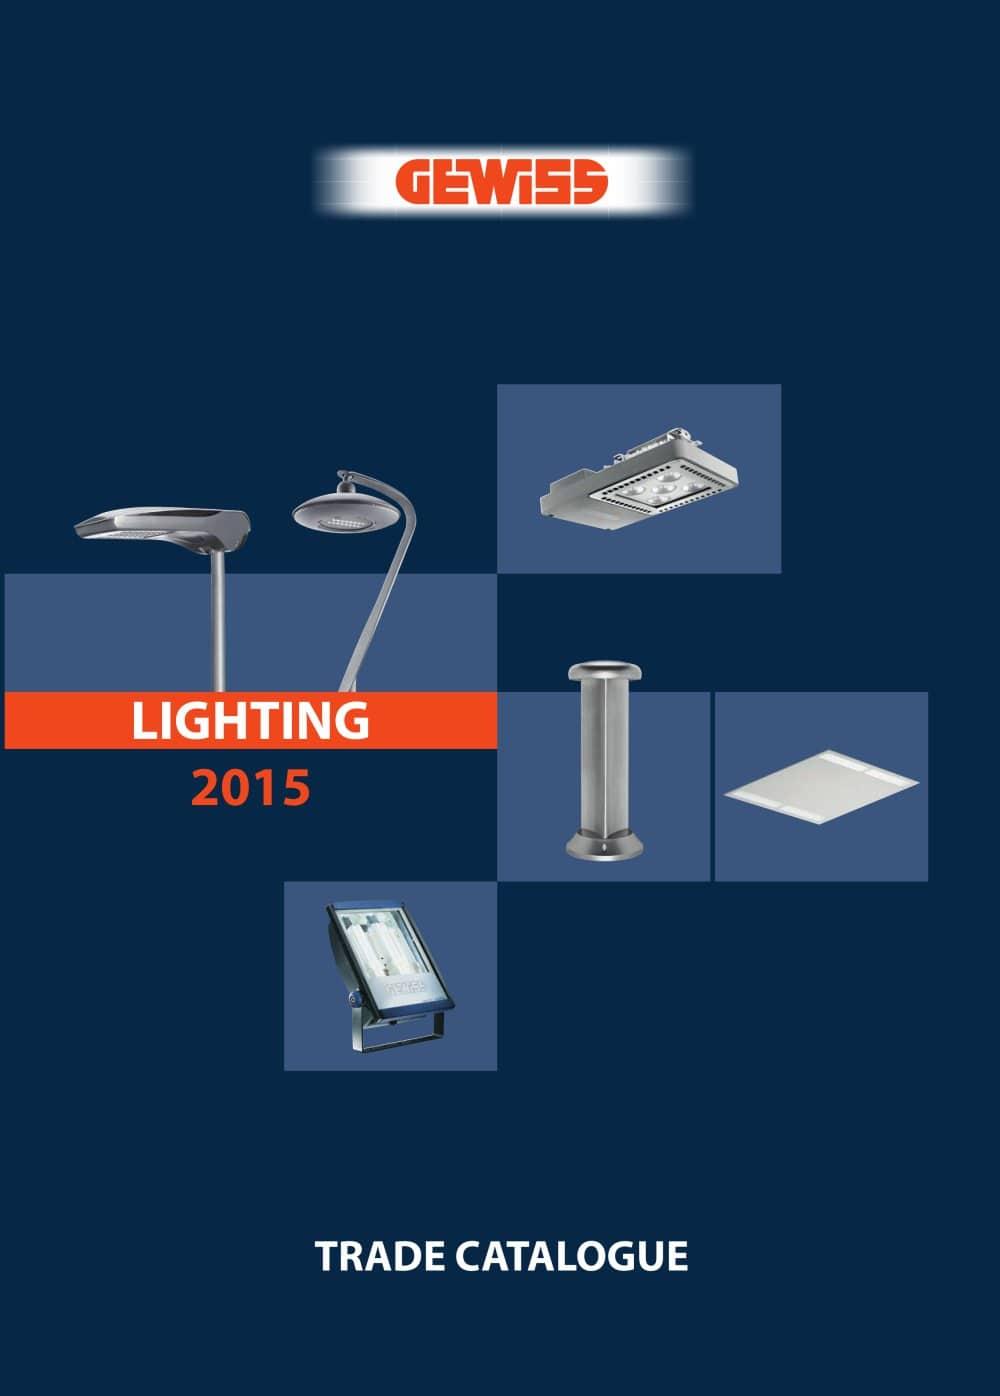 Lighting trade catalog 2015 gewiss pdf catalogue technical lighting trade catalog 2015 1 459 pages asfbconference2016 Gallery